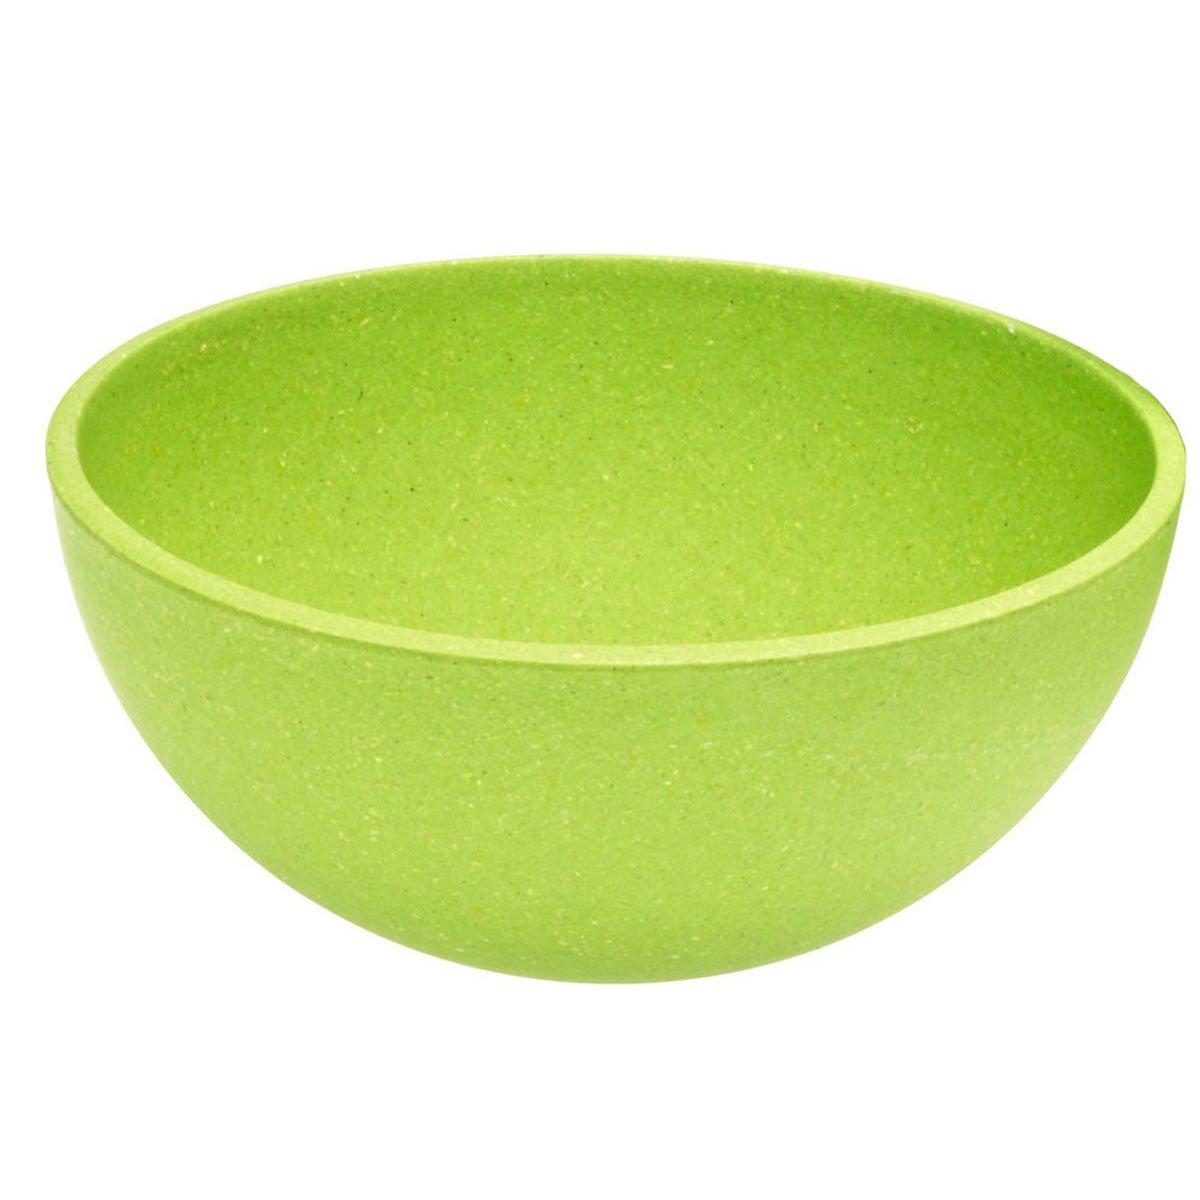 10 x 10 x 10 cm Magu Dip Bowl Nature 10cm in Green